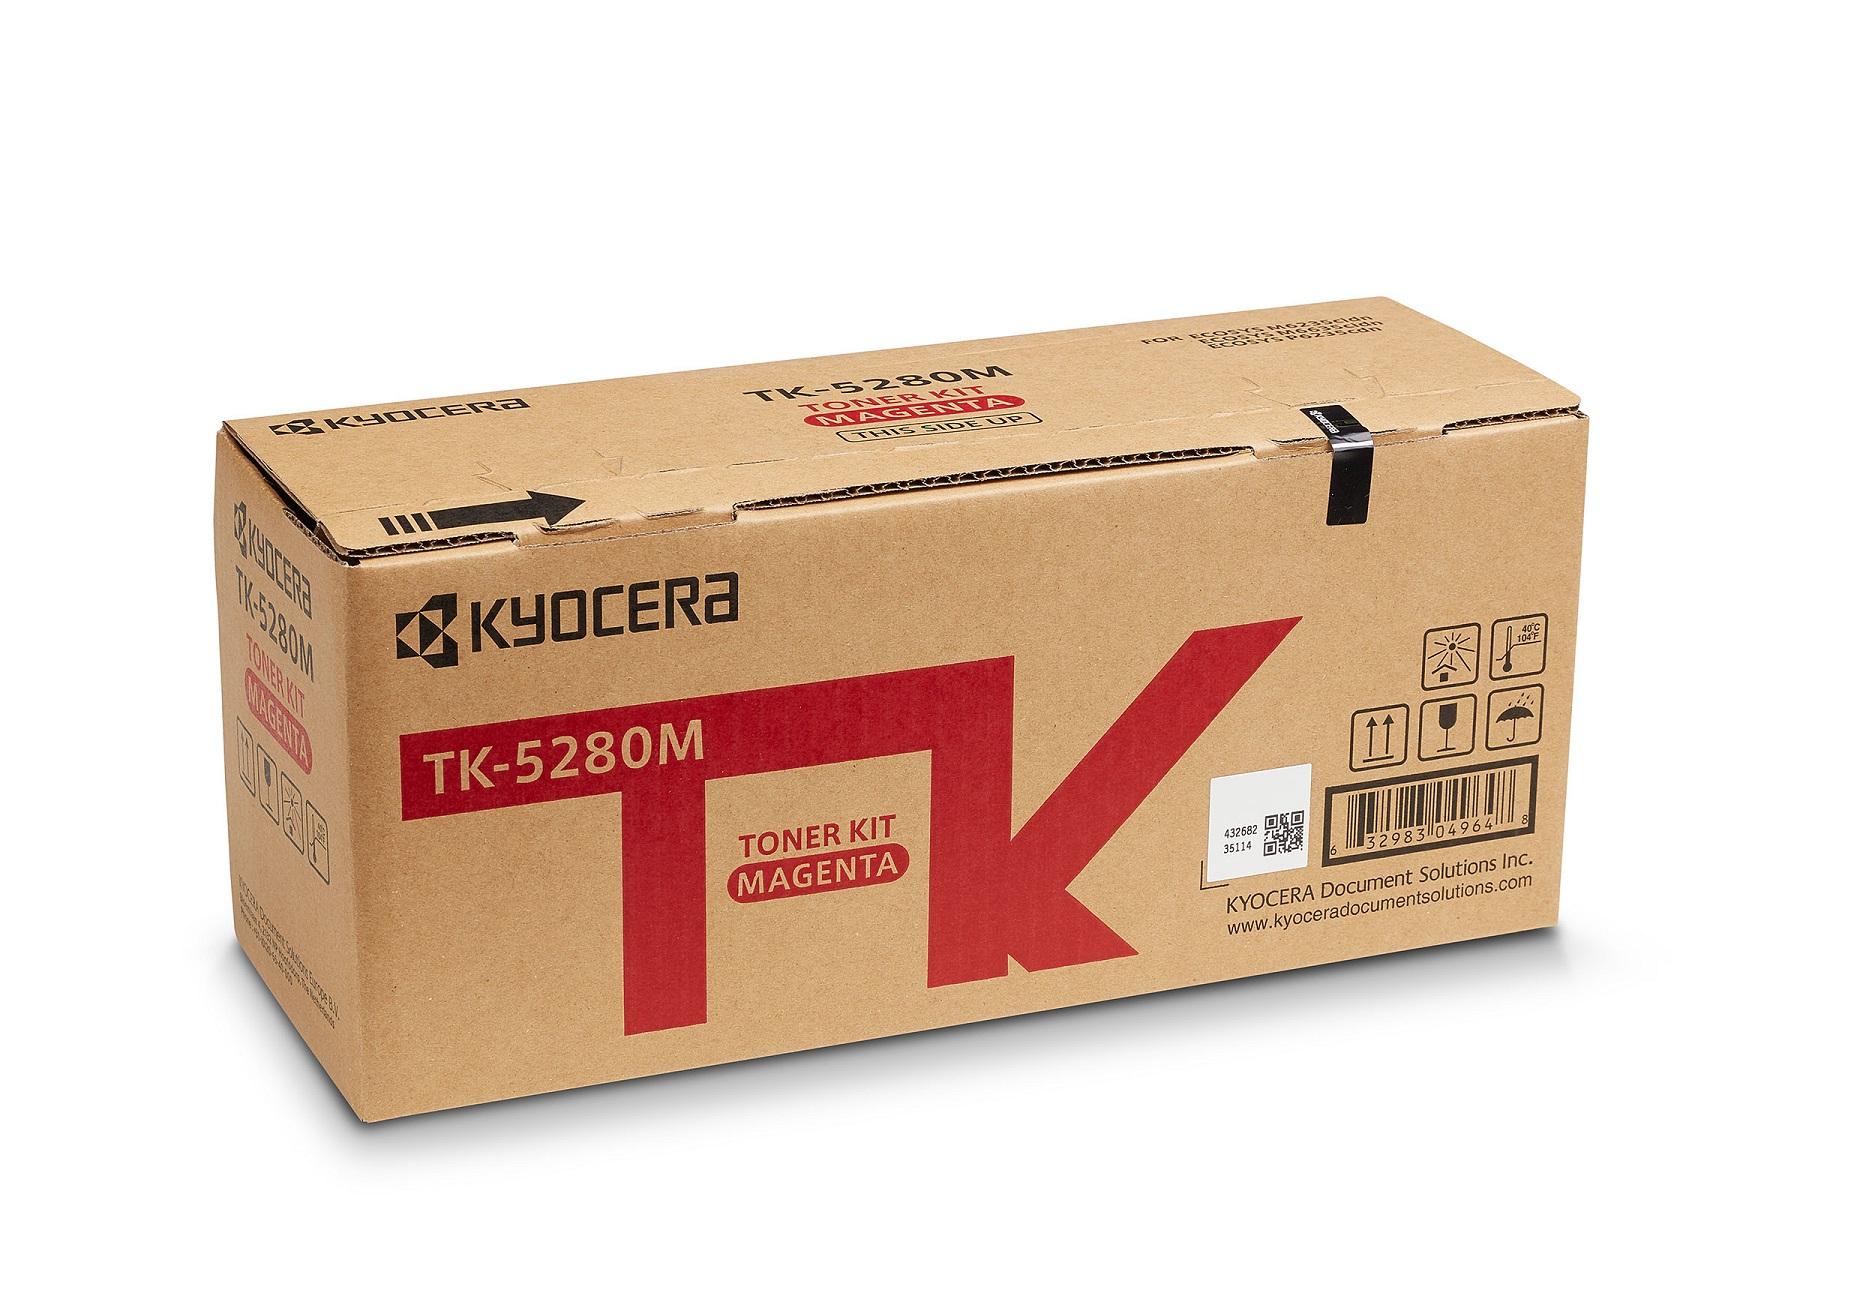 KYOCERA TK-5280M Original Magenta 1 pieza(s)